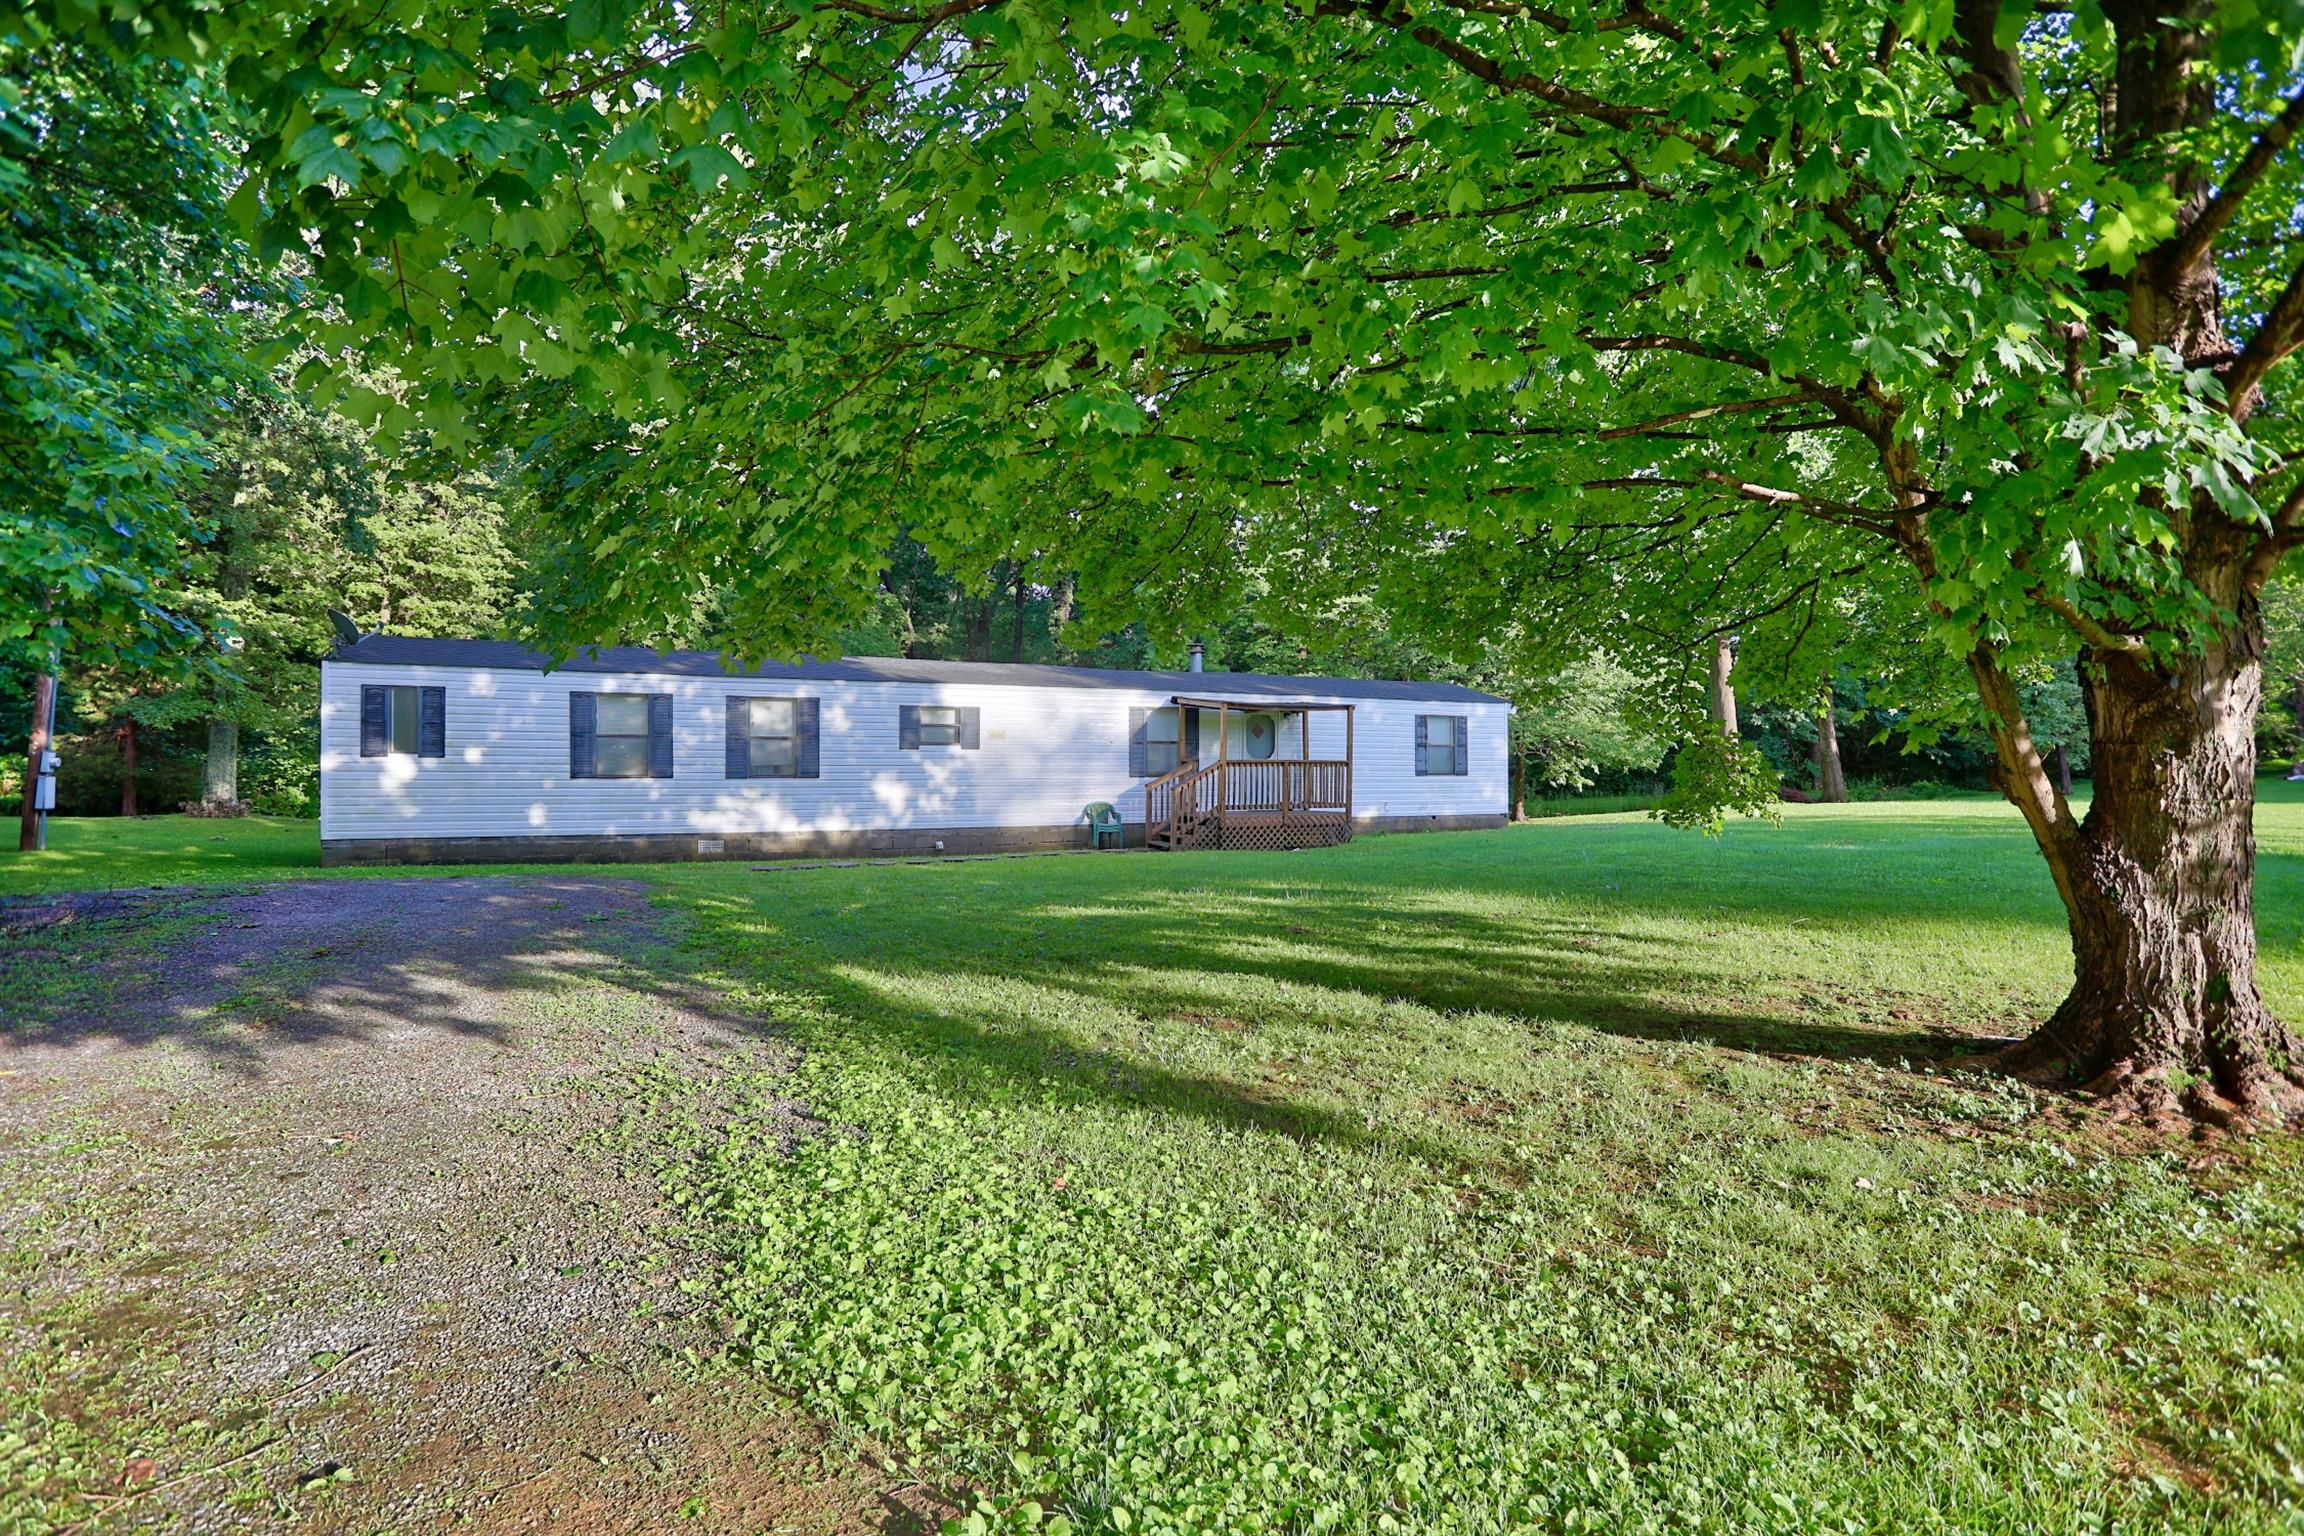 8329 Morningview Dr, Cross Plains, TN 37049 - Cross Plains, TN real estate listing